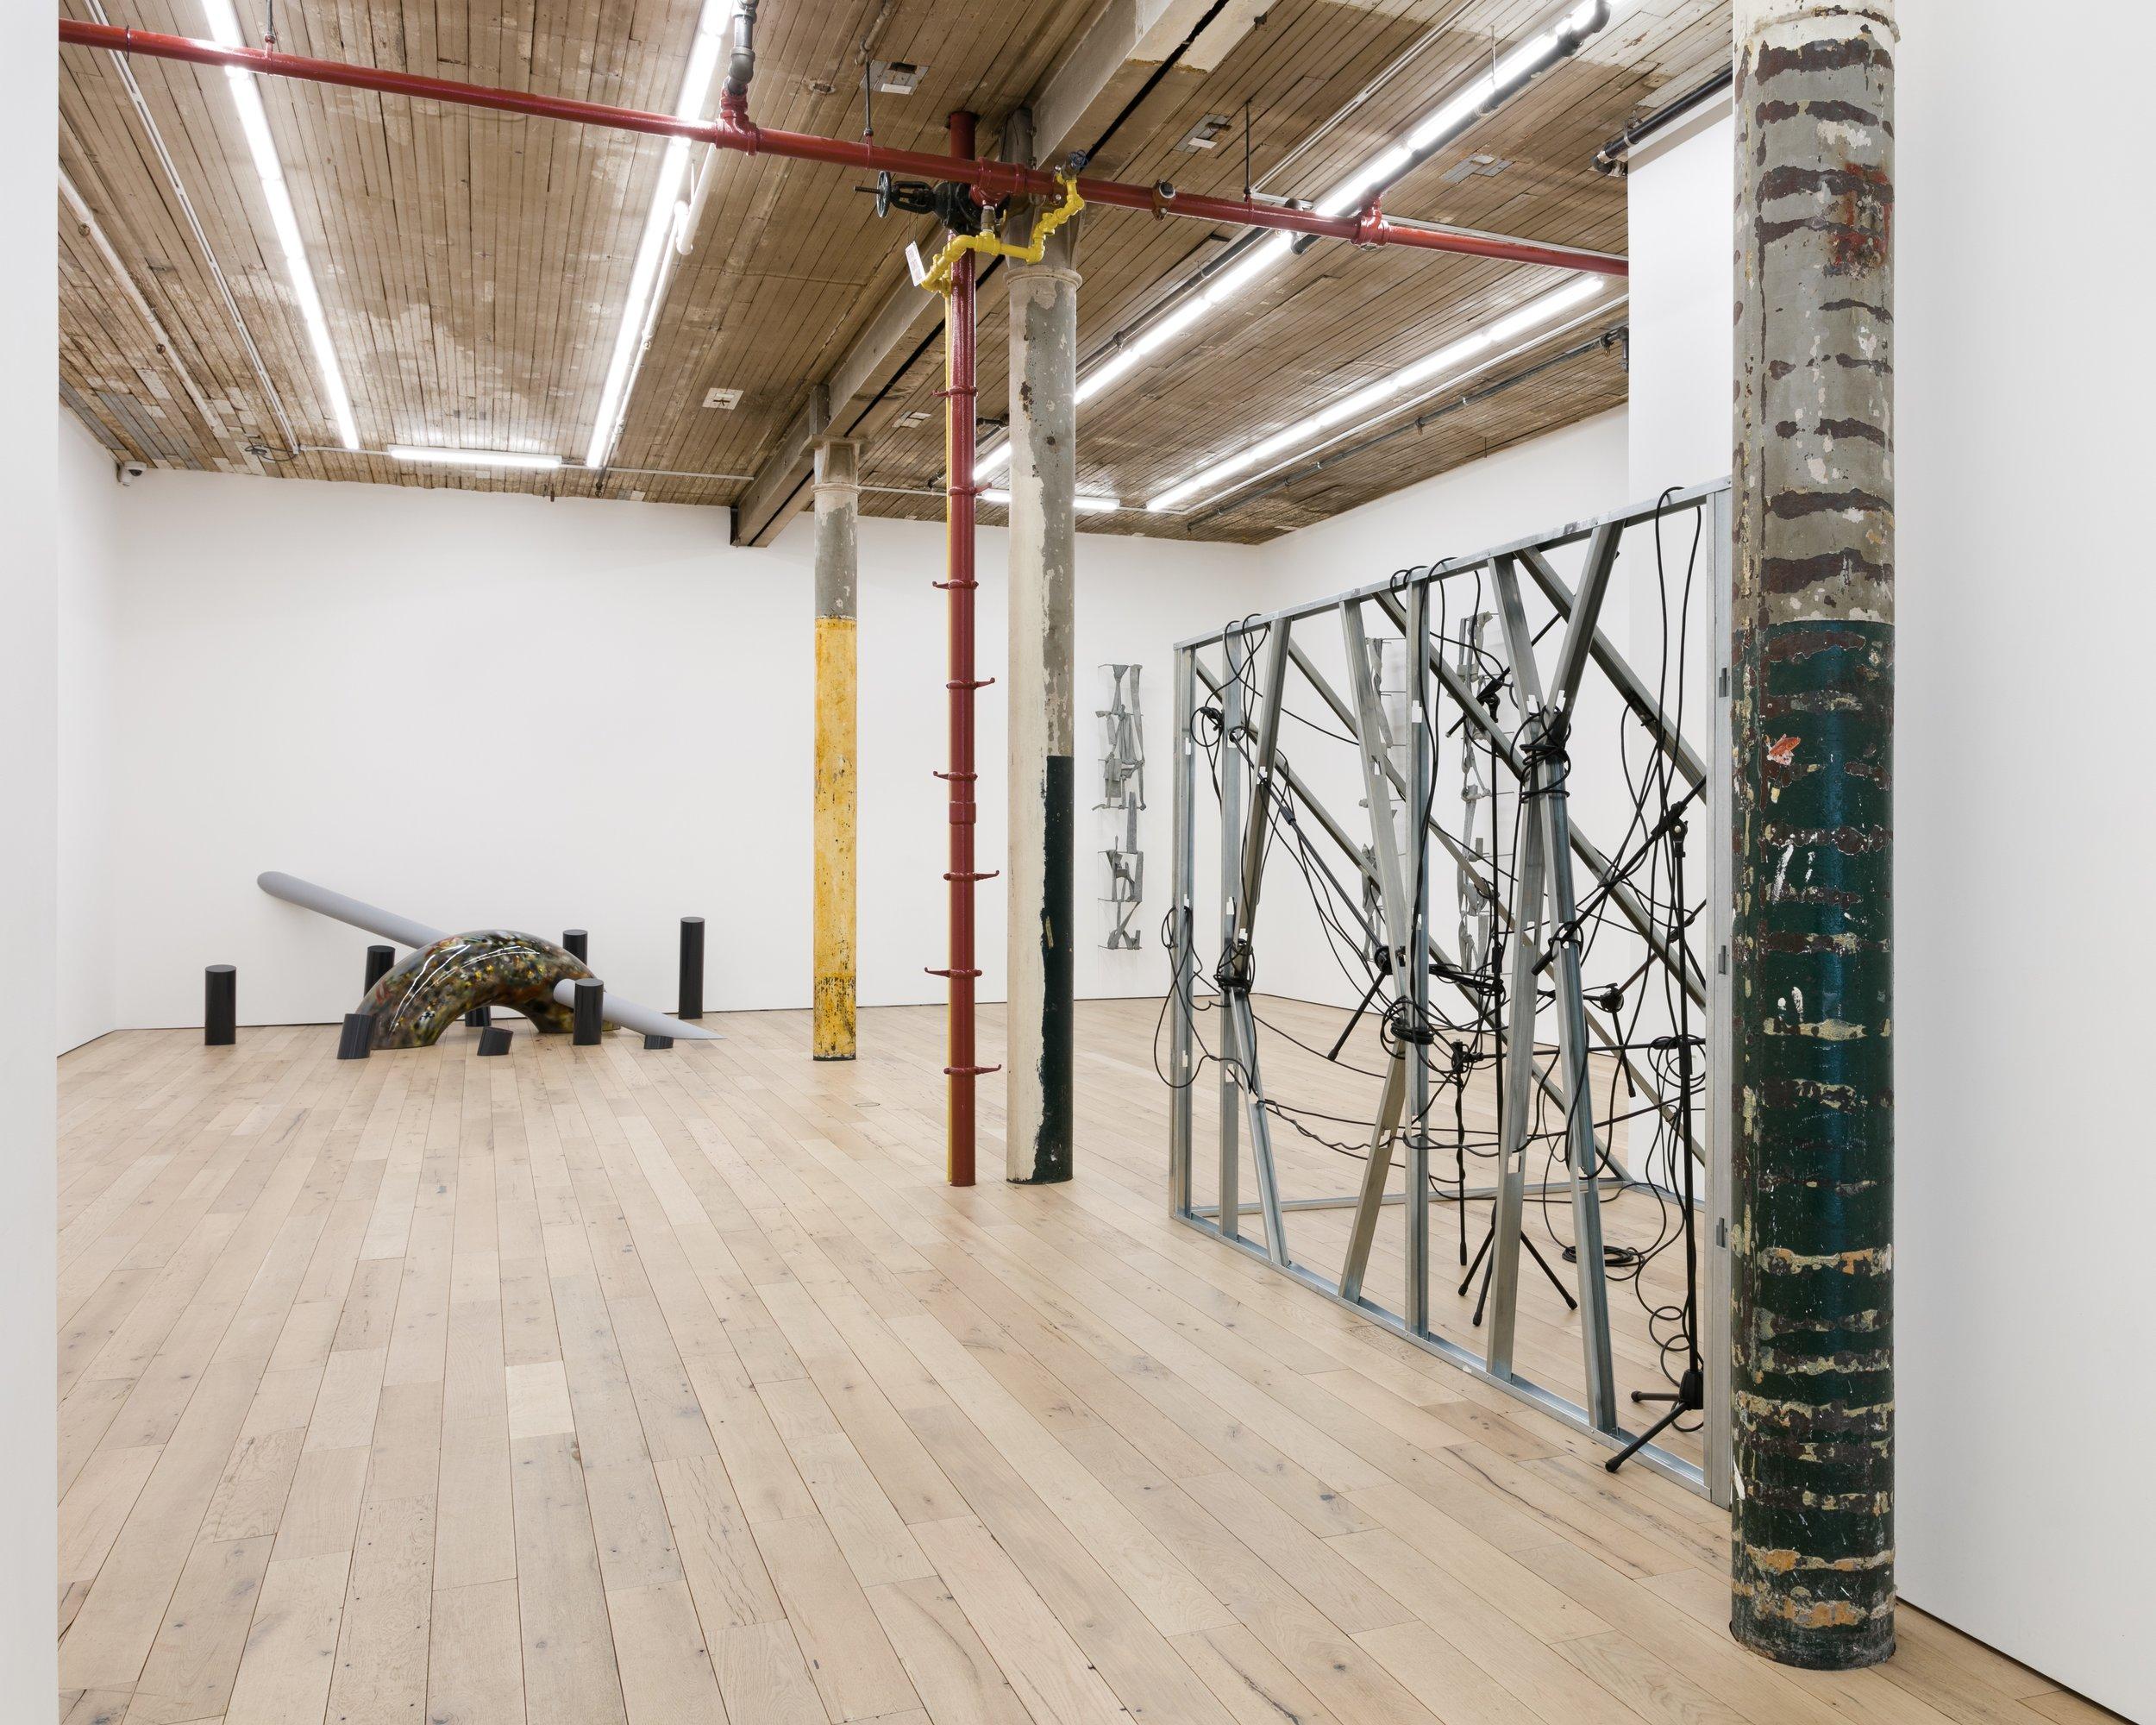 Fall Apart, Martos Gallery, 2019, Installation View 2